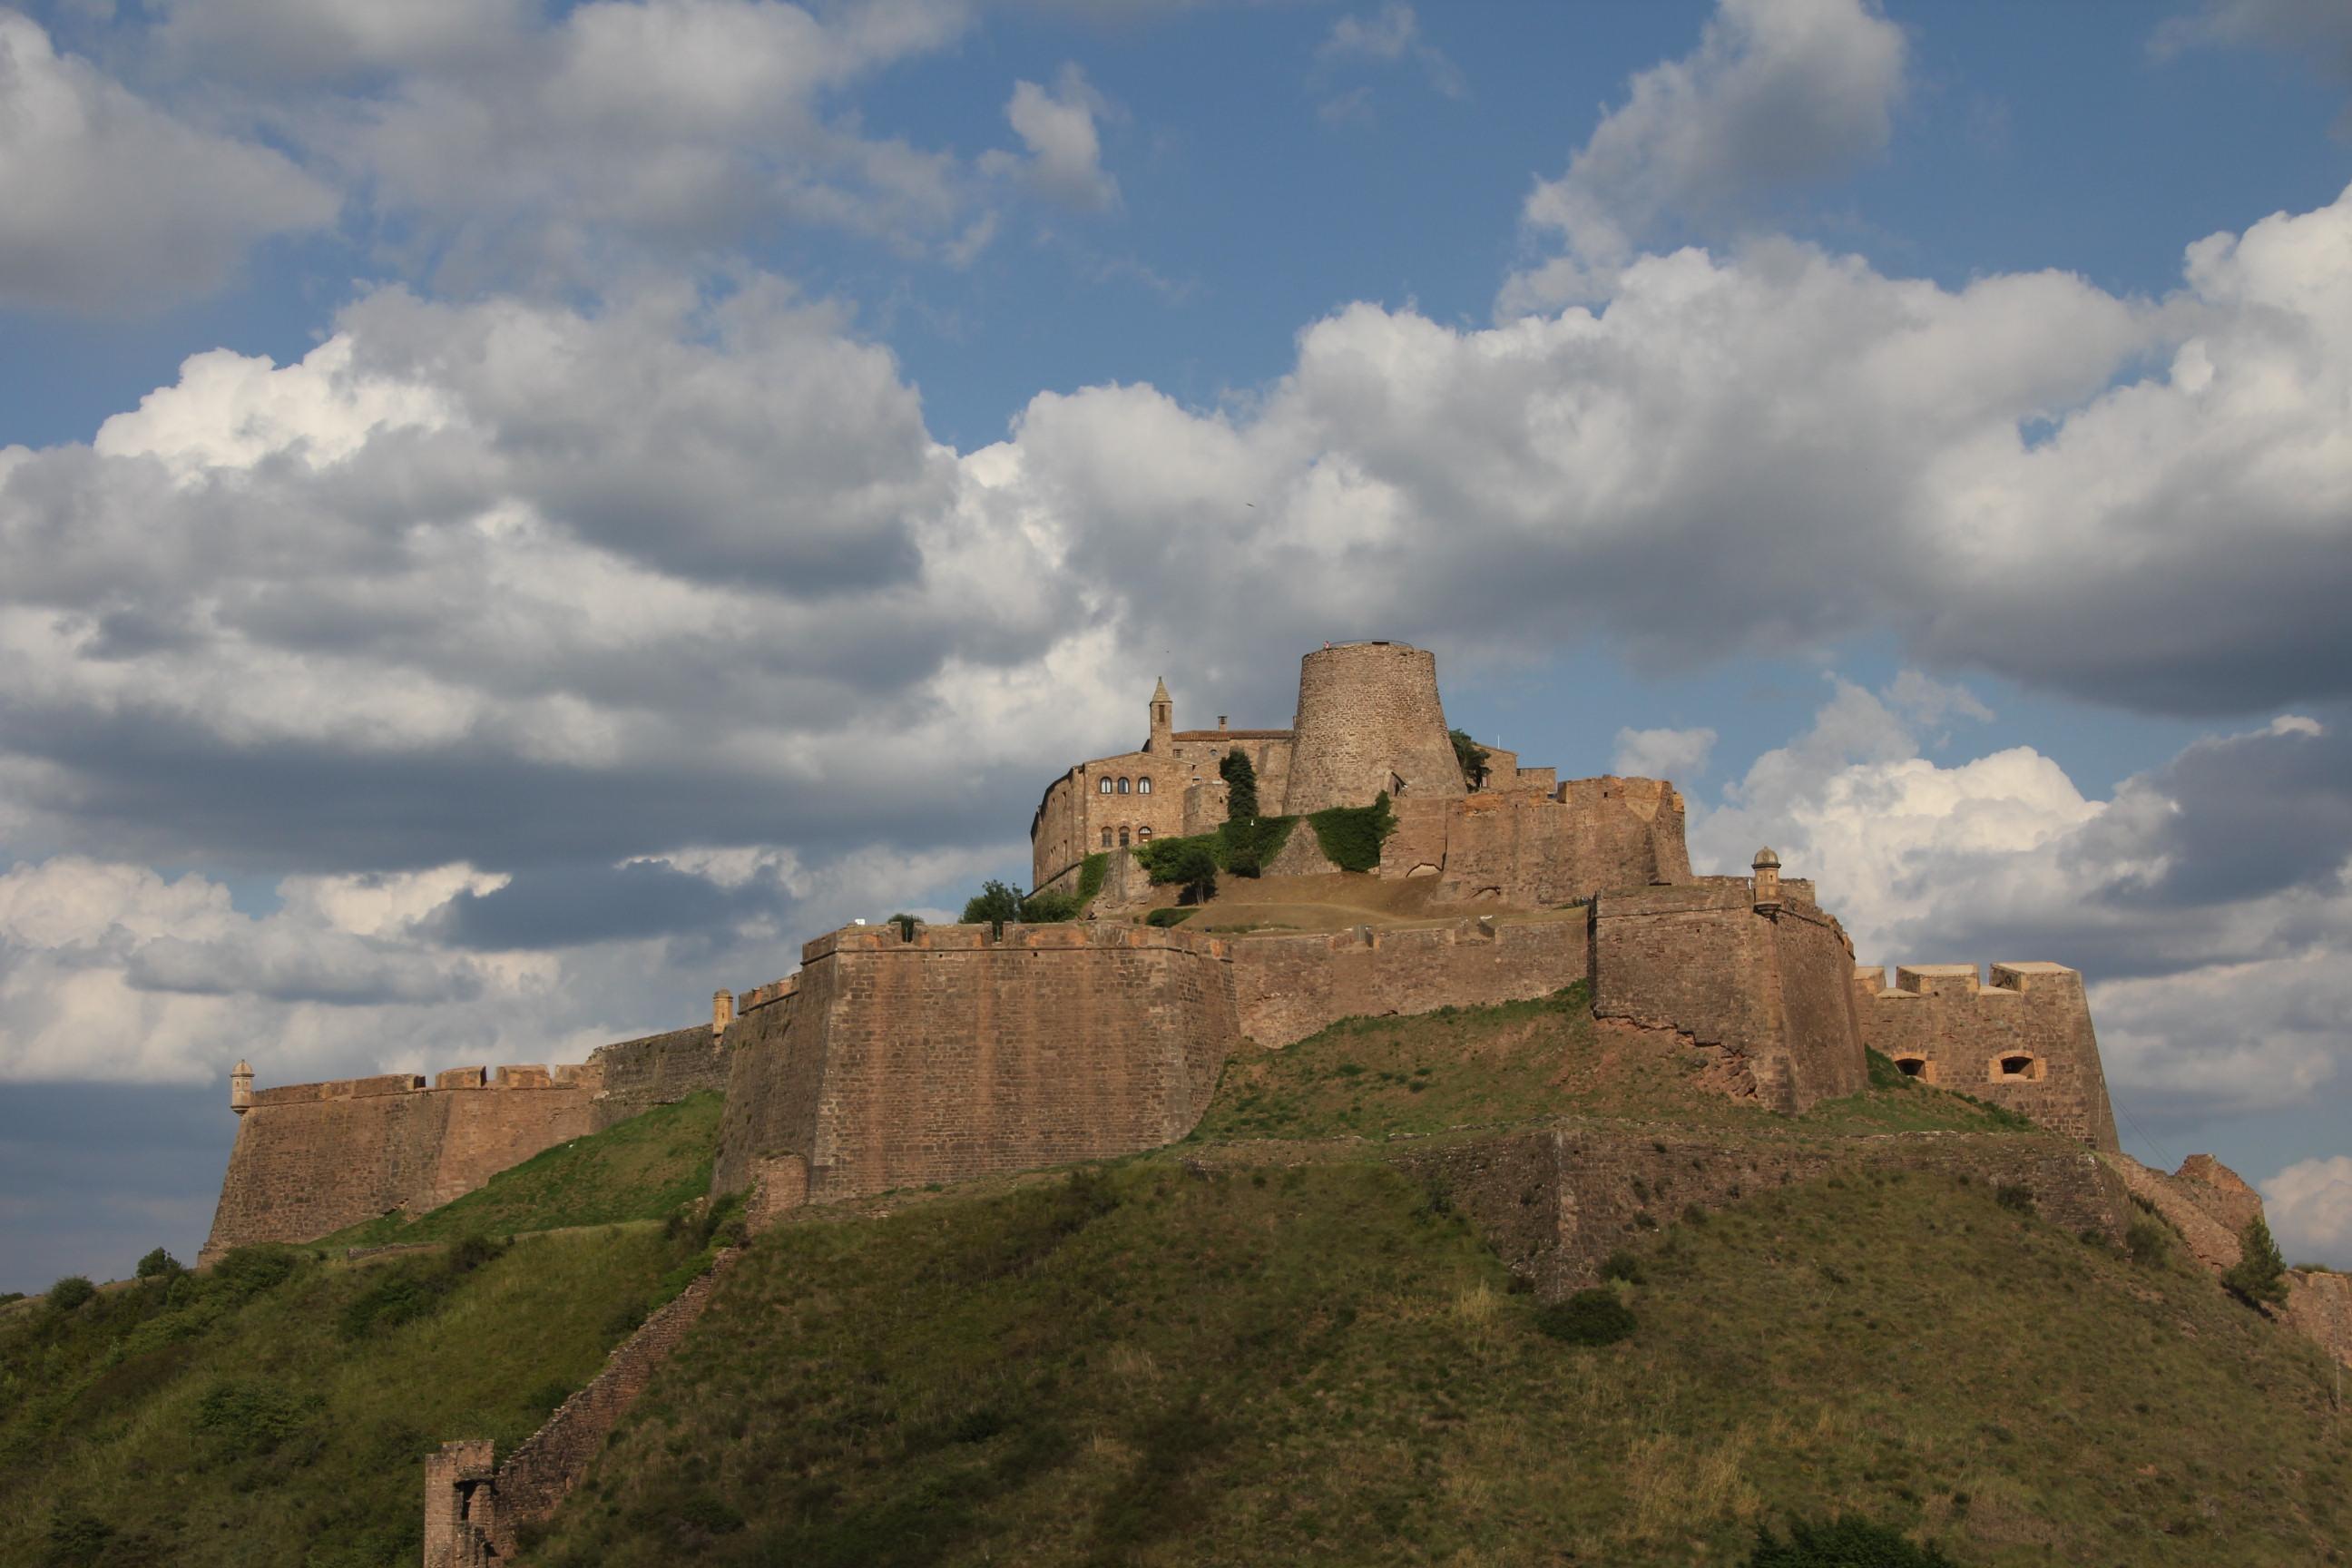 File:Castell de Cardona -1.JPG - Wikimedia Commons